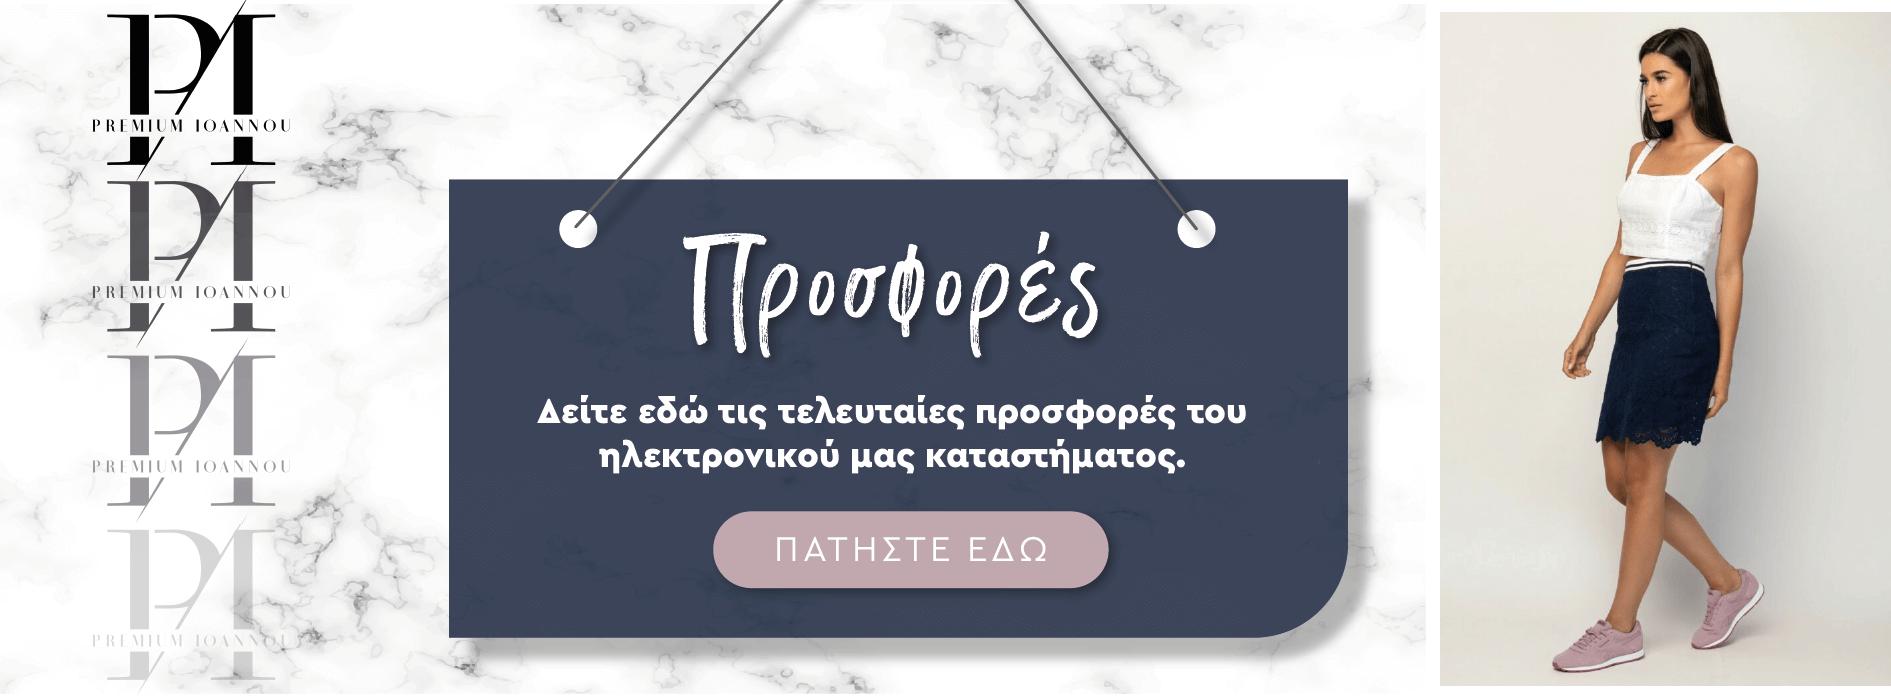 Prosfores Banner2 (1)